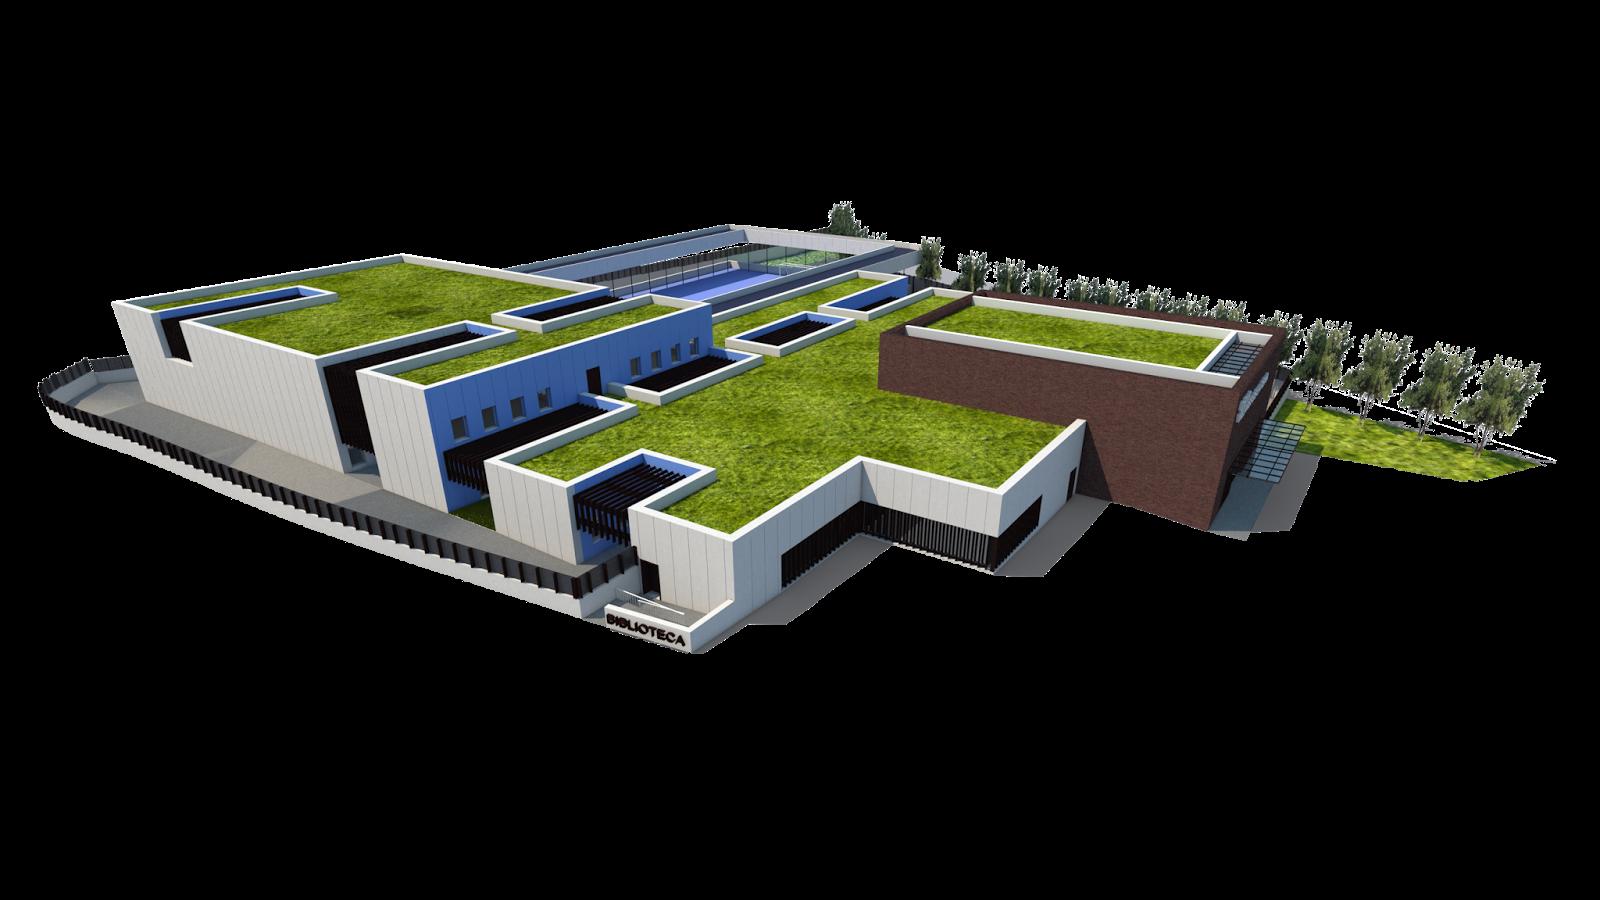 Qnoarquitectos concurso proyecto de construcci n de un c for Concurso docentes exterior